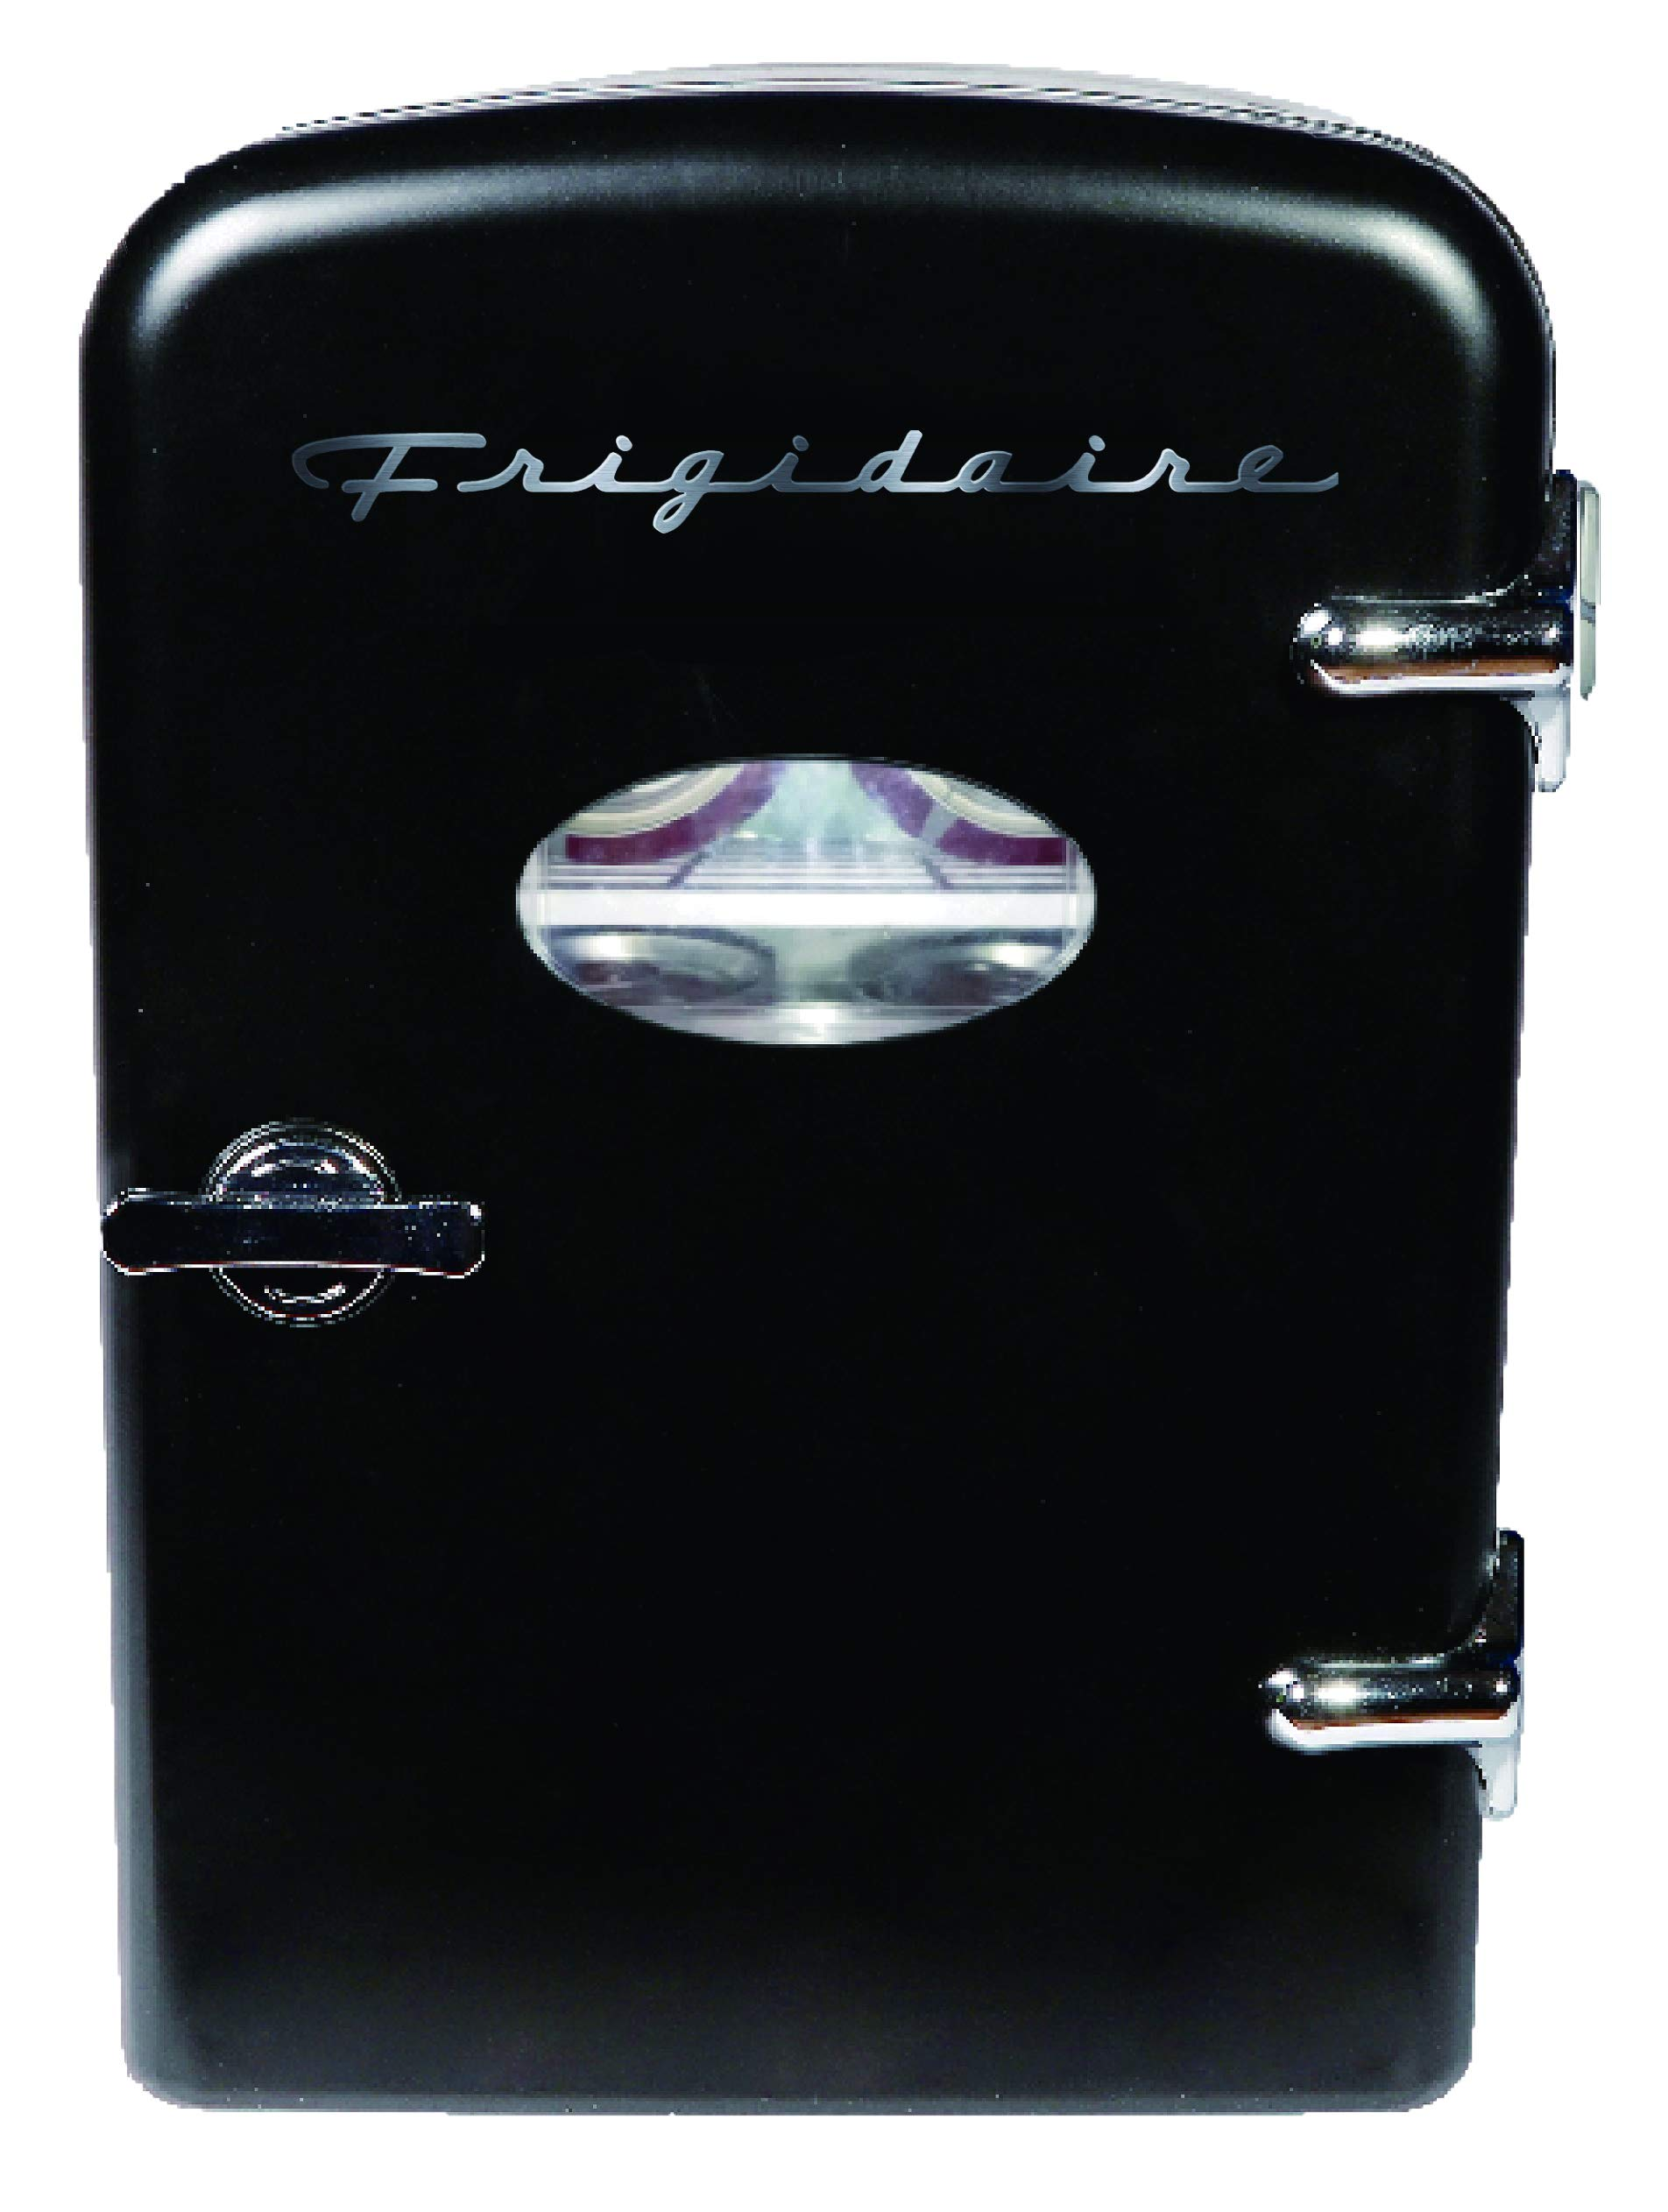 Frigidaire EFMIS129-BLACK 6 Can Retro Mini Portable Personal Fridge/Cooler for Home, Office or Dorm